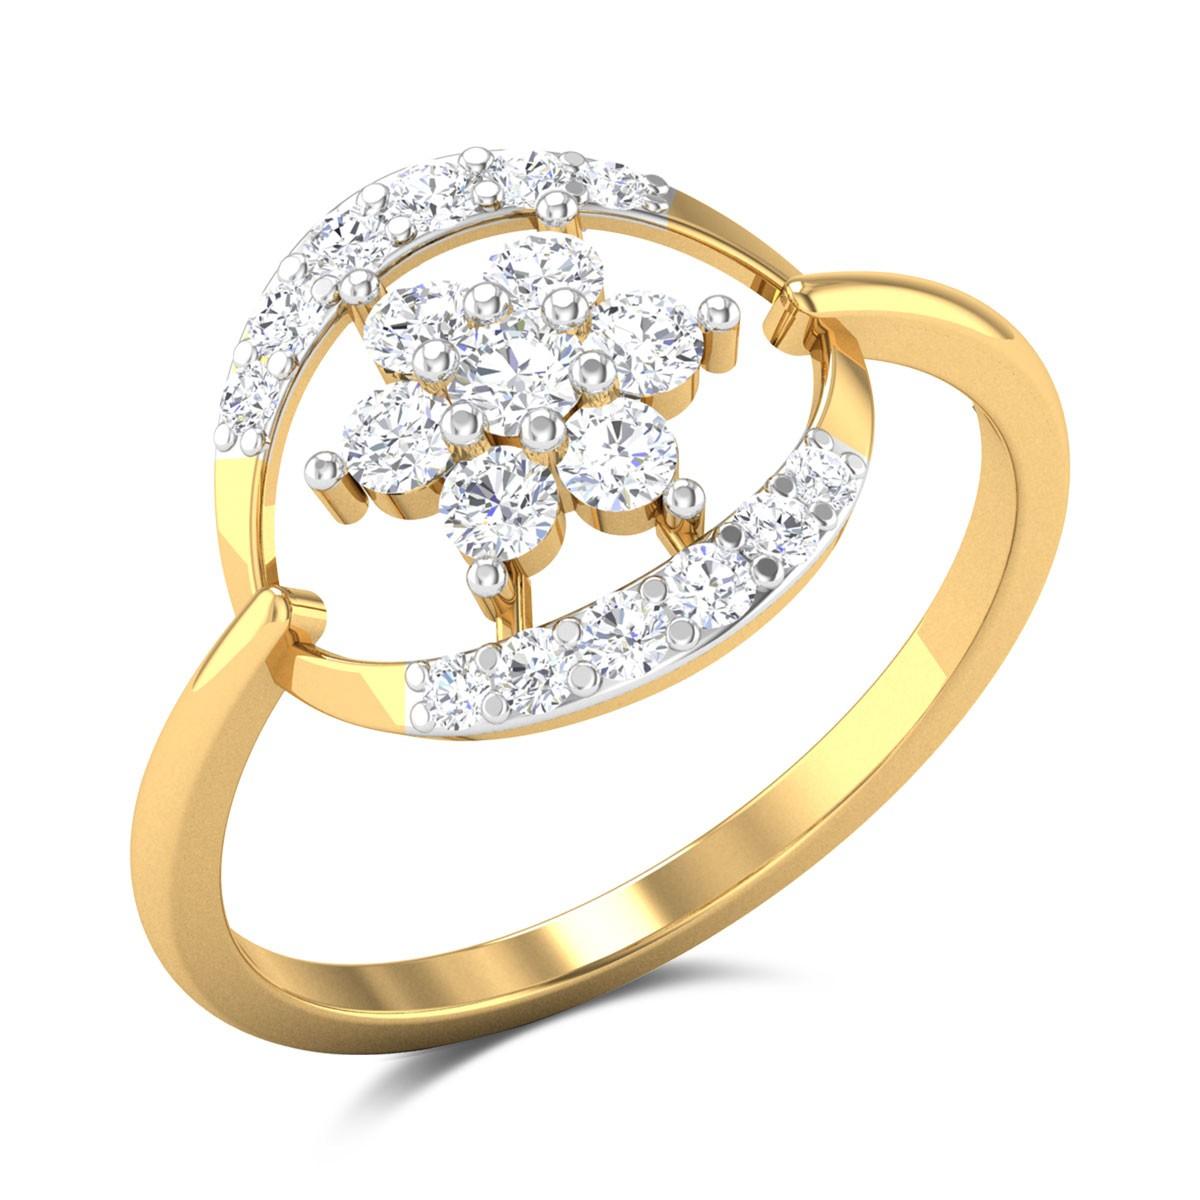 Rashne Floral Diamond Ring